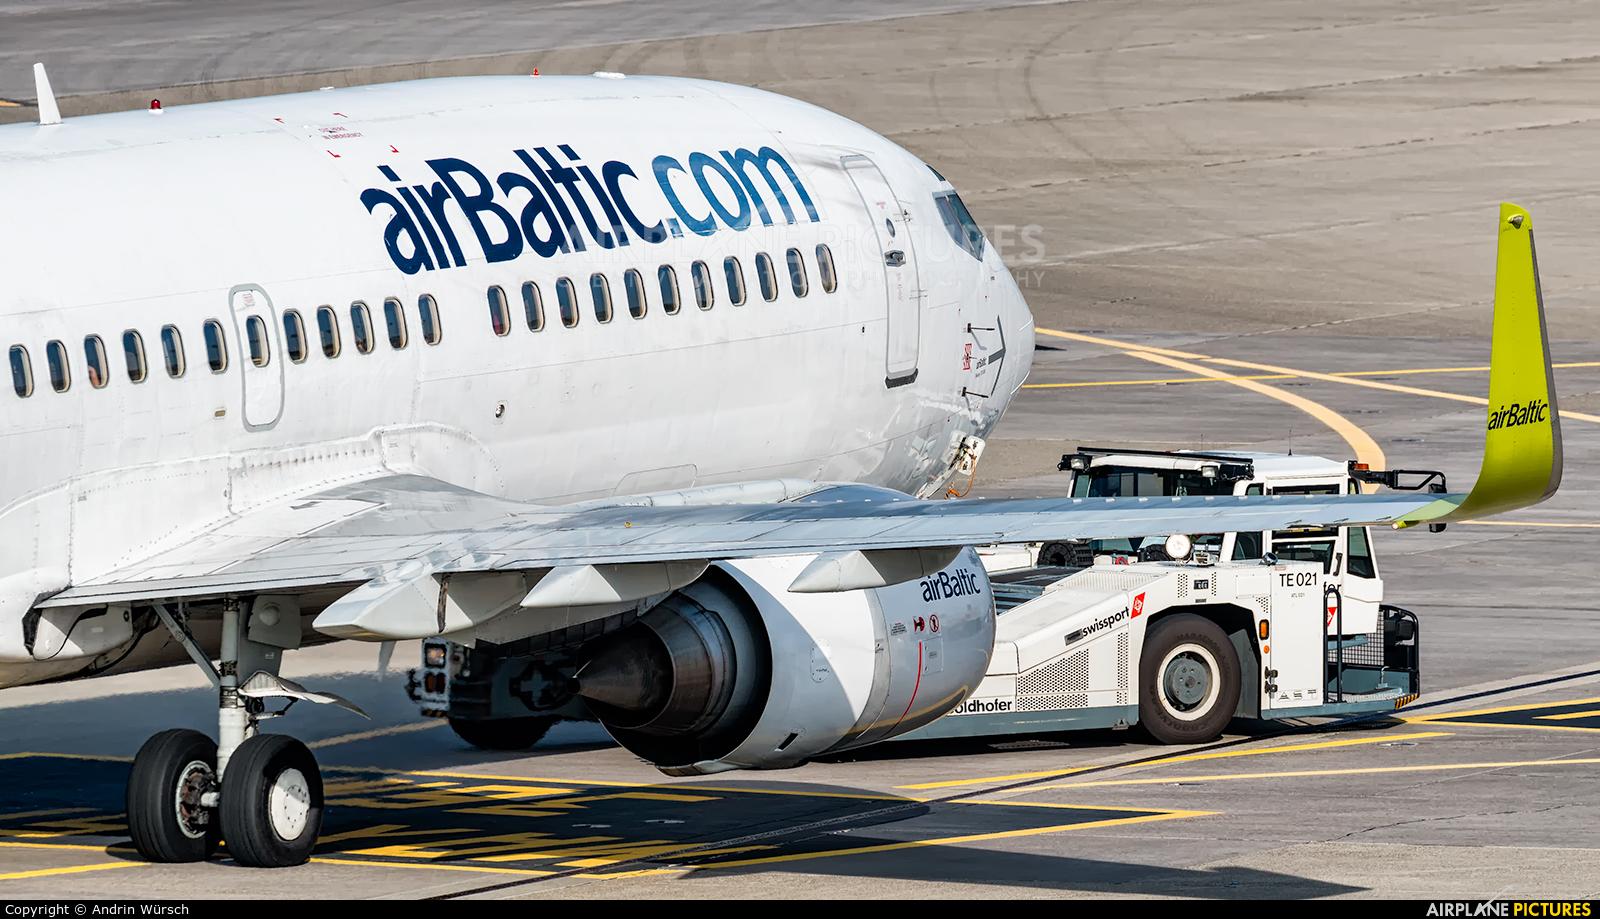 Air Baltic YL-BBY aircraft at Zurich